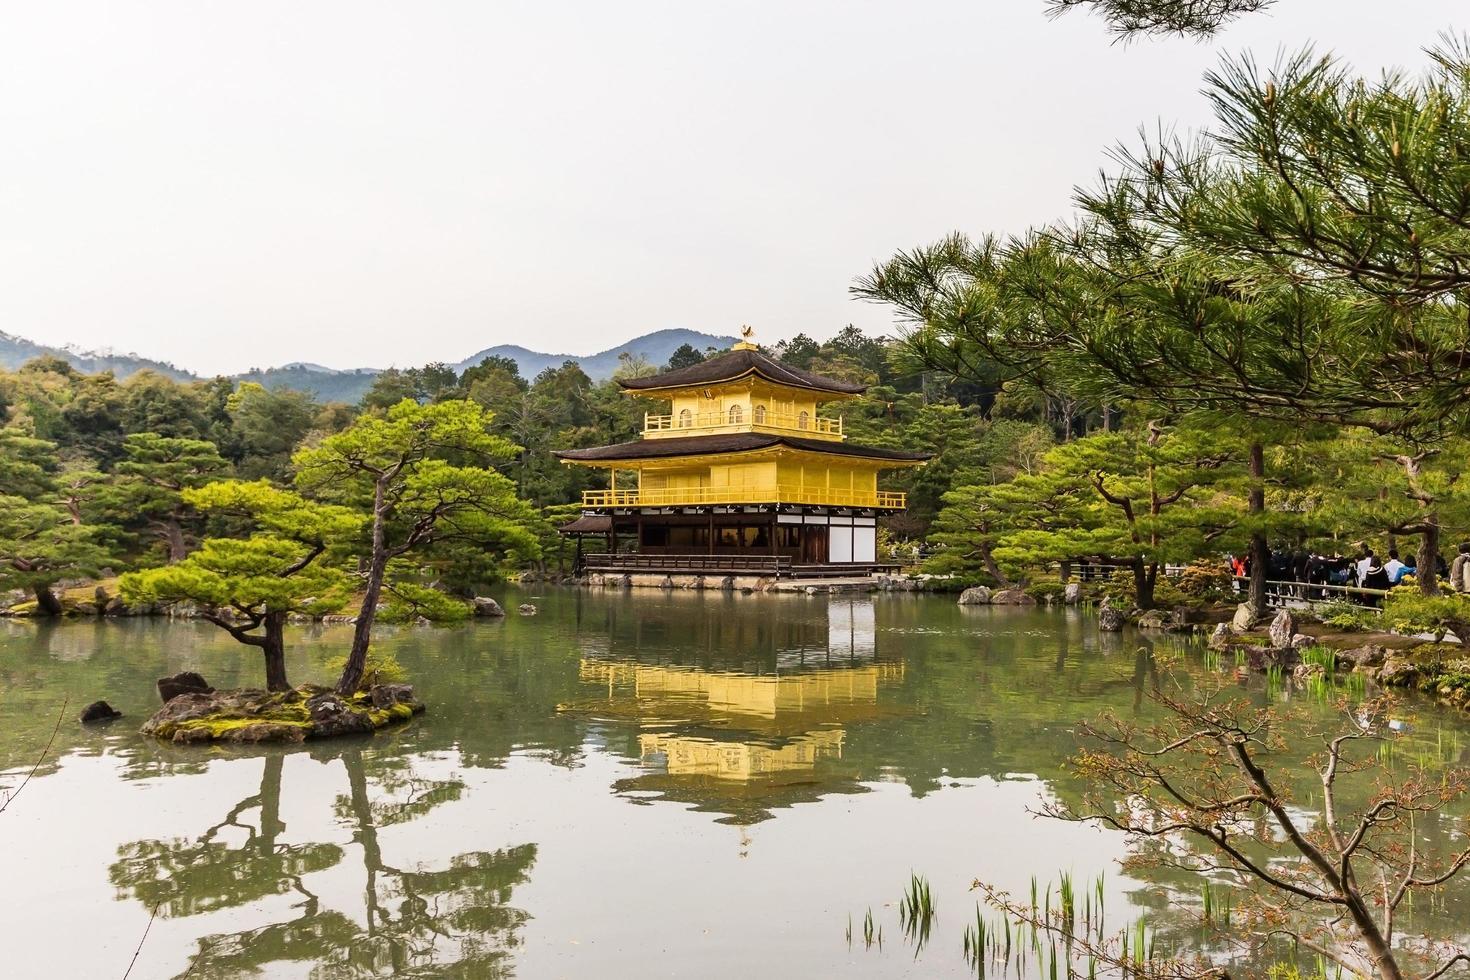 The Kinkakuji Temple in Kyoto, Japan photo